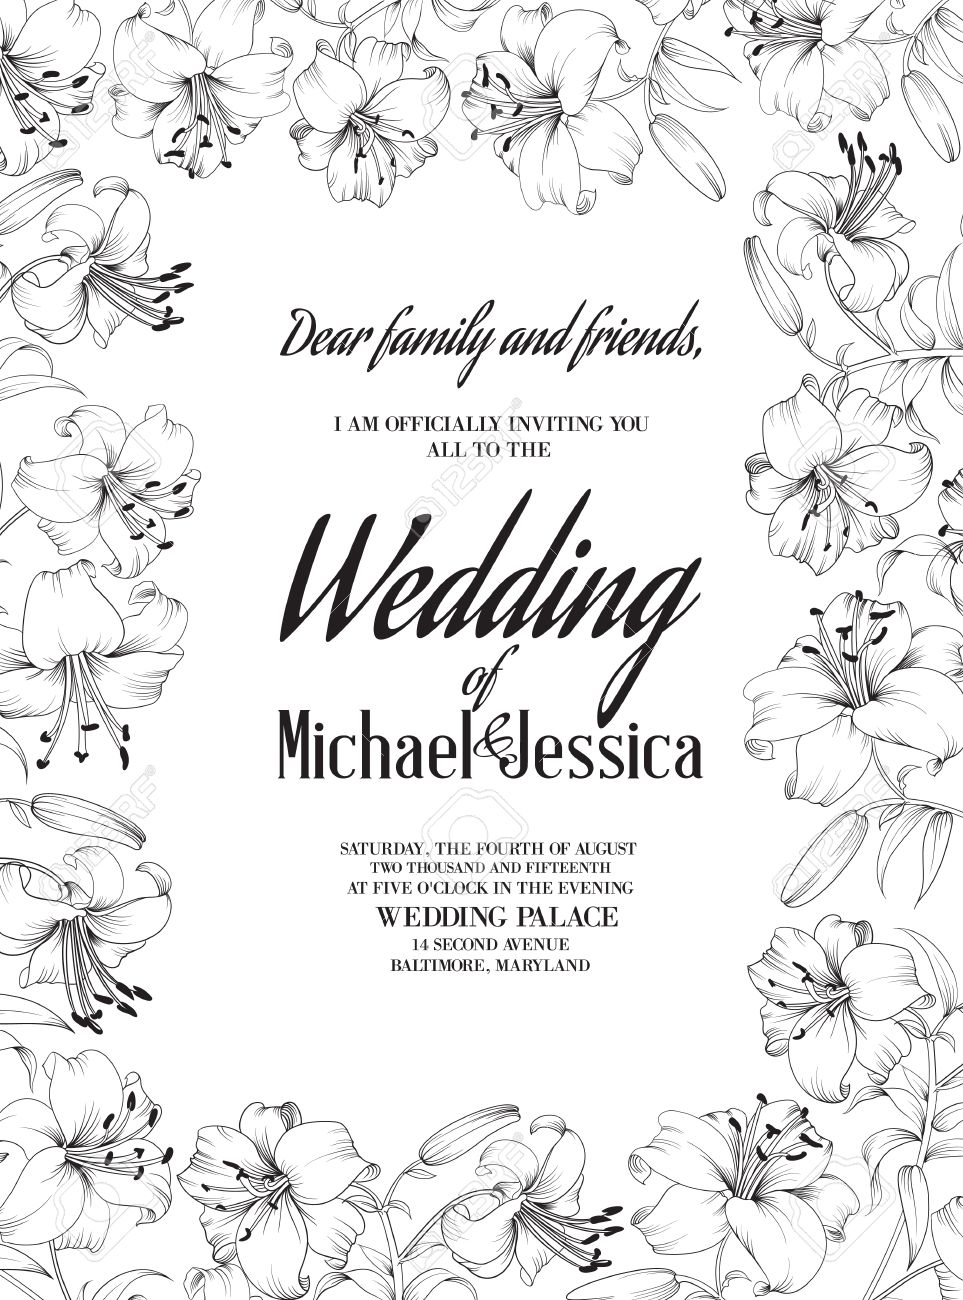 wedding card lily flowers invitation card template vector wedding card lily flowers invitation card template white blooming lily and text wedding invitation over them vector illustration